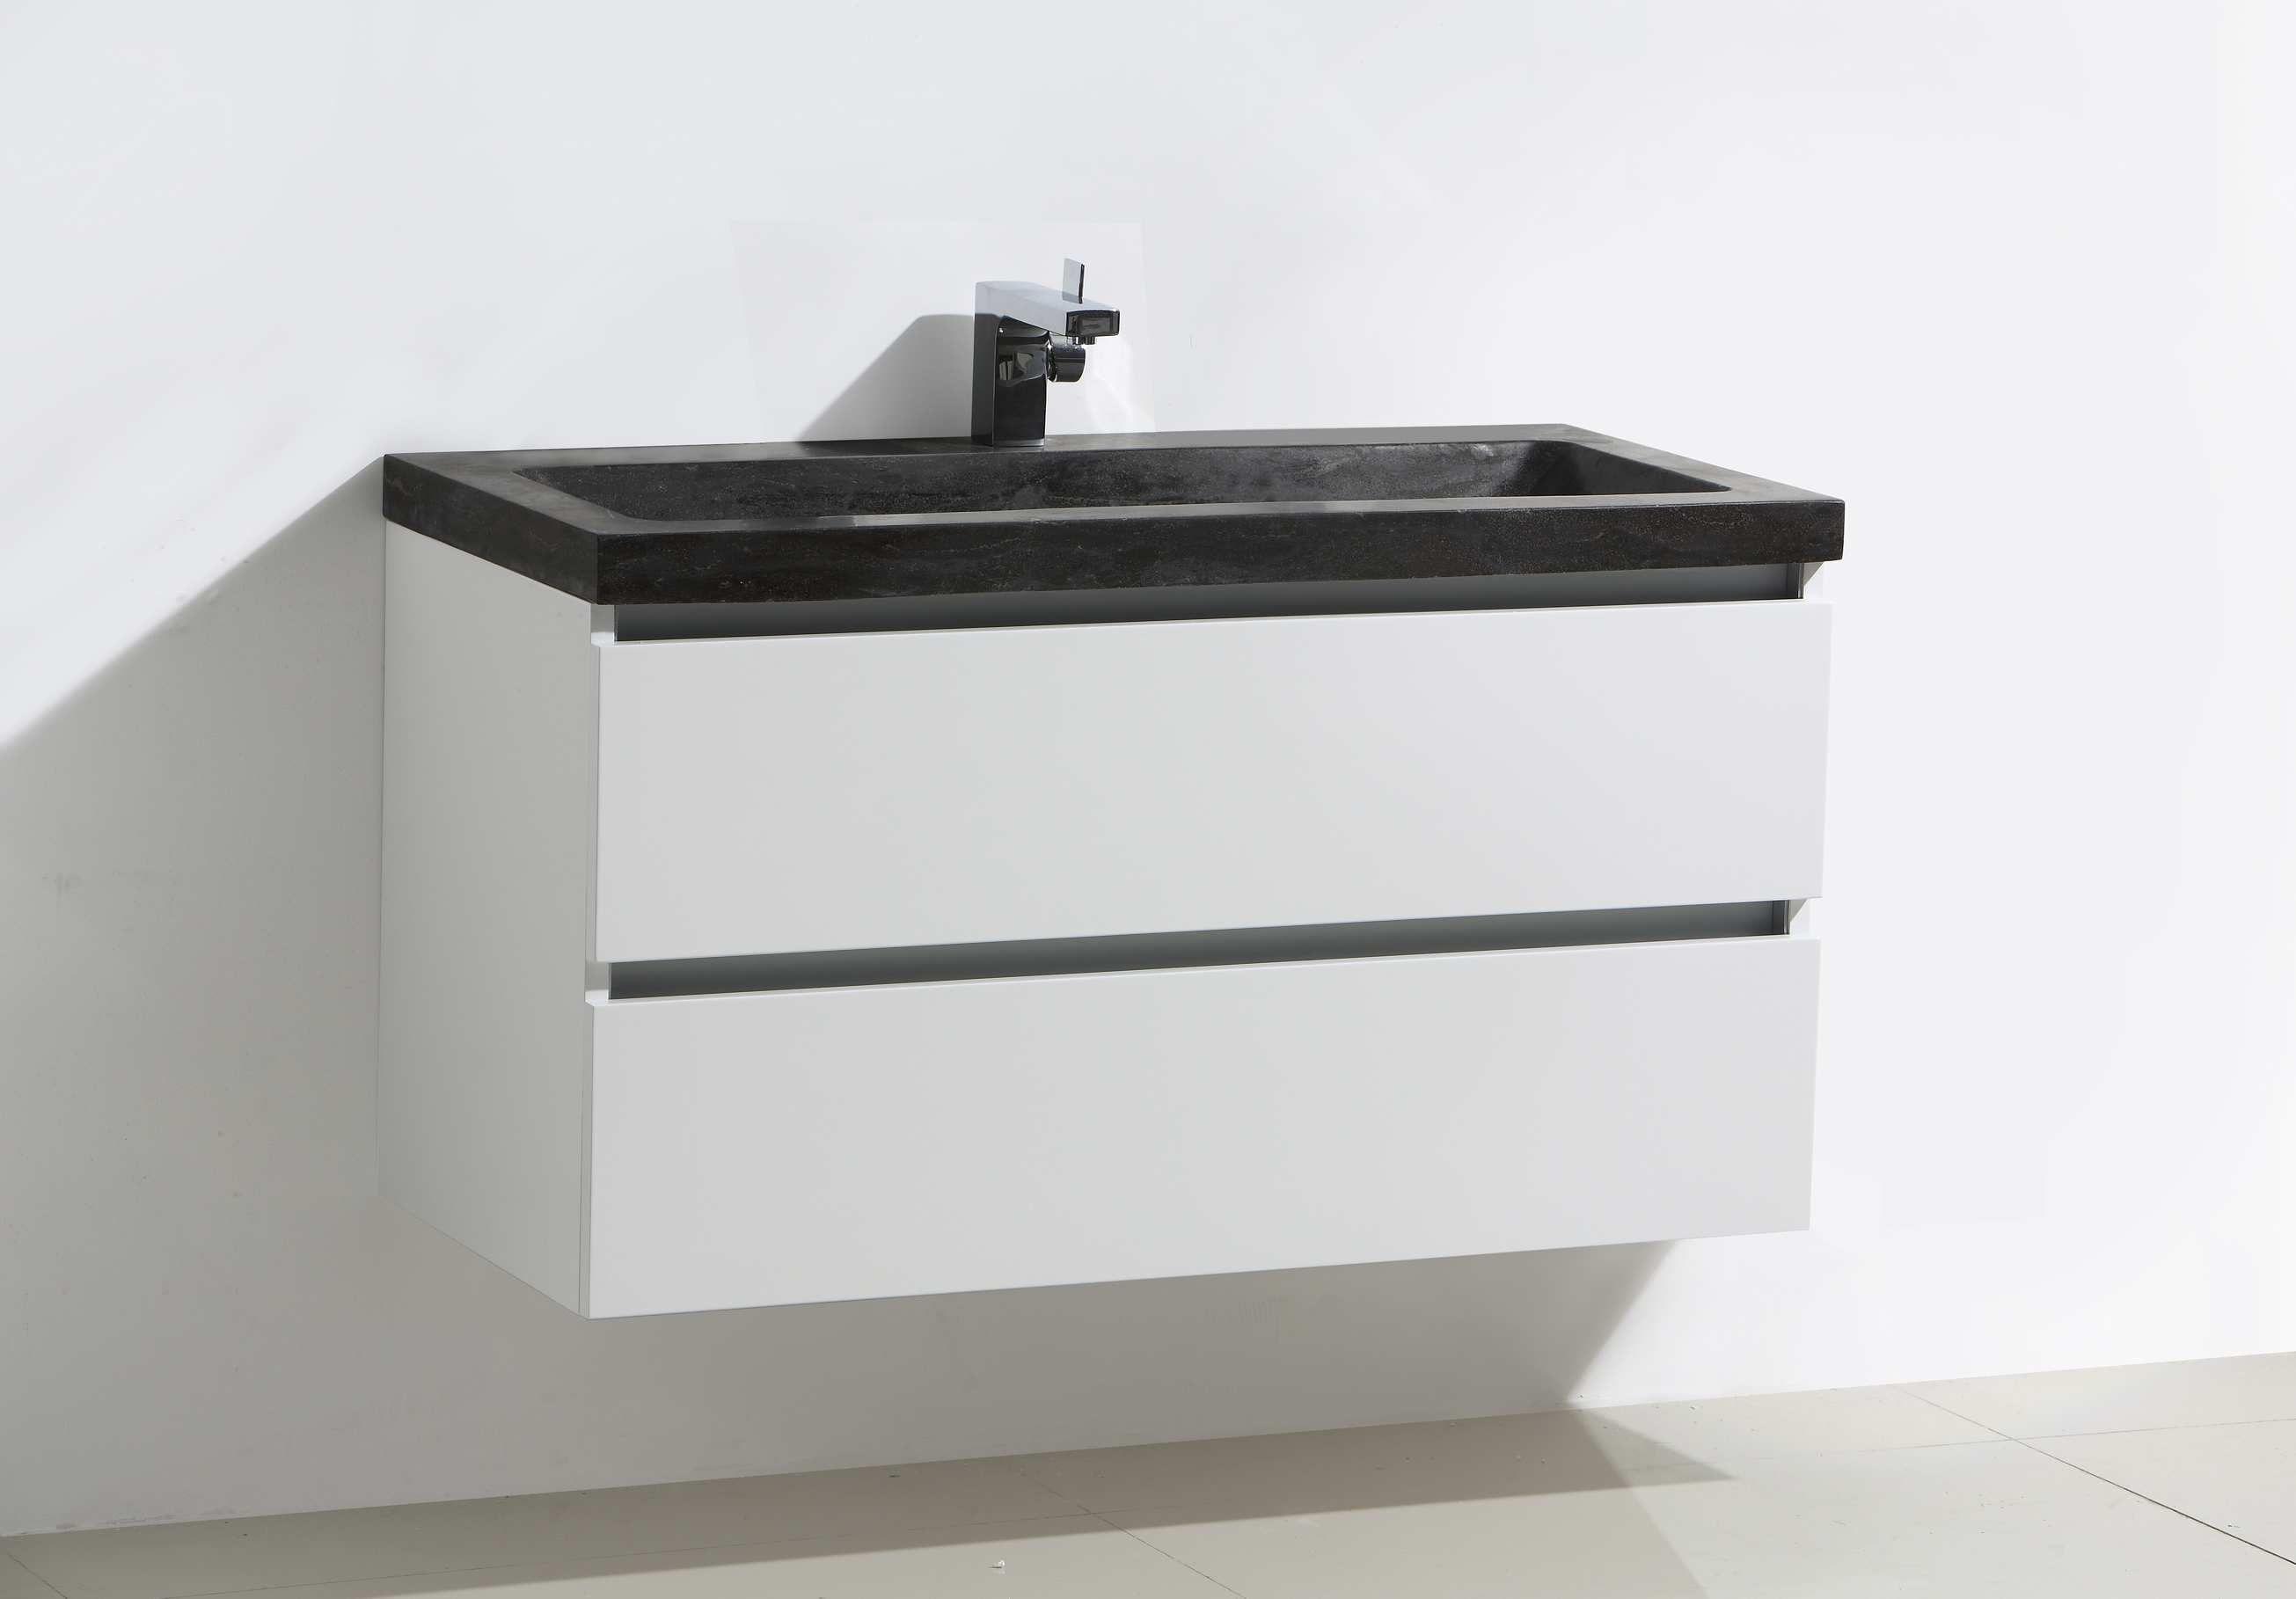 Badkamer Accessoires - Lambini Designs Trend Stone badkamermeubel ...